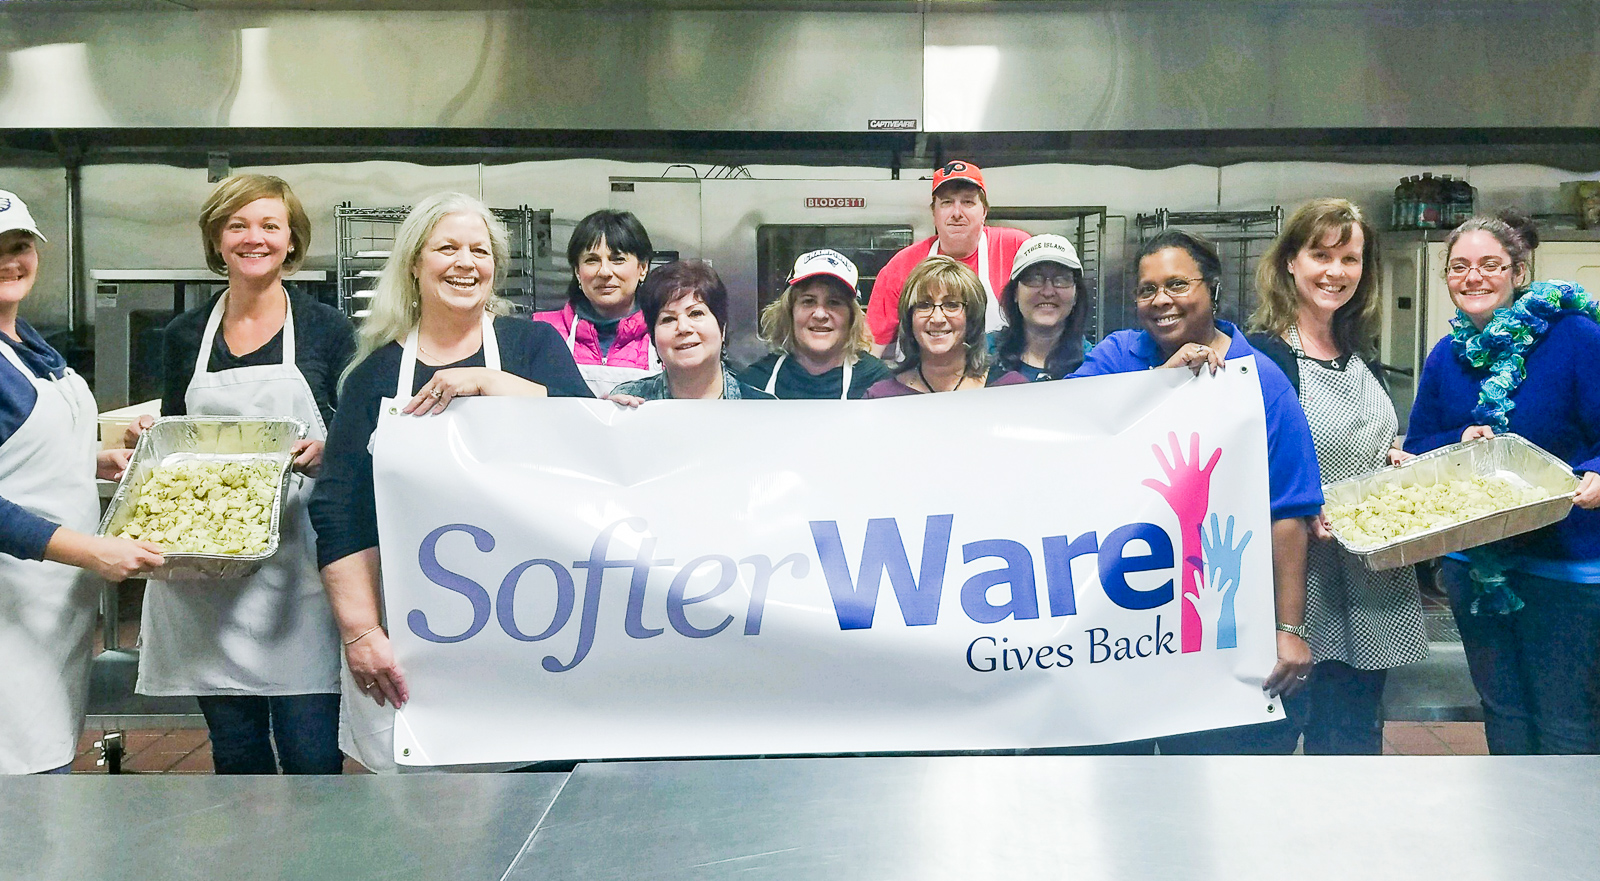 SofterWare Gives Back